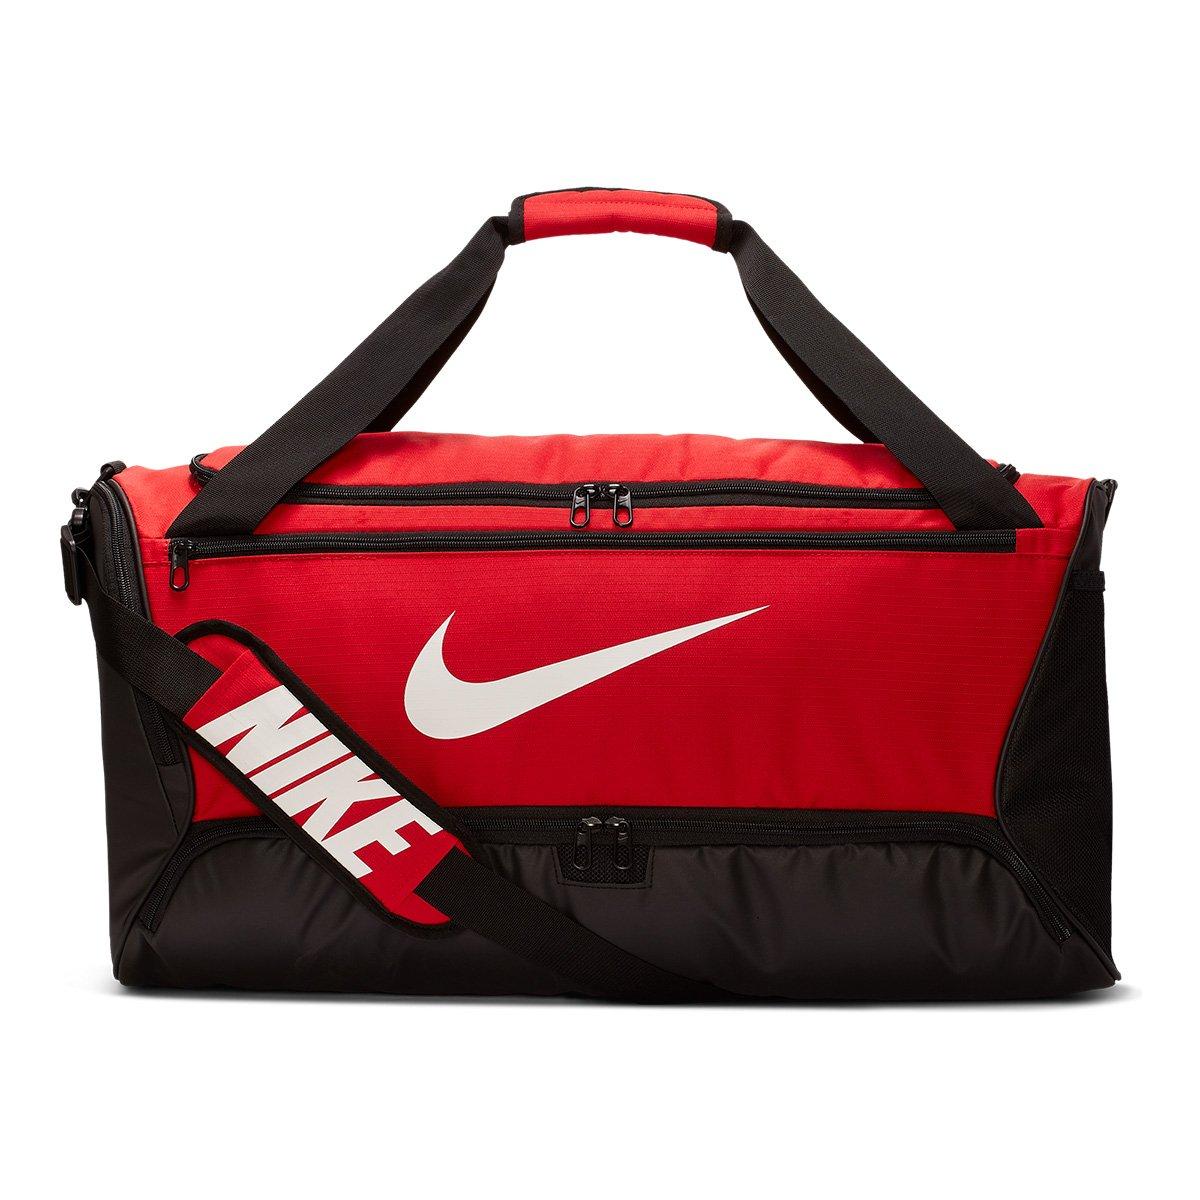 Mala Nike Brasilia M Duff 9.0 - 60 Litros